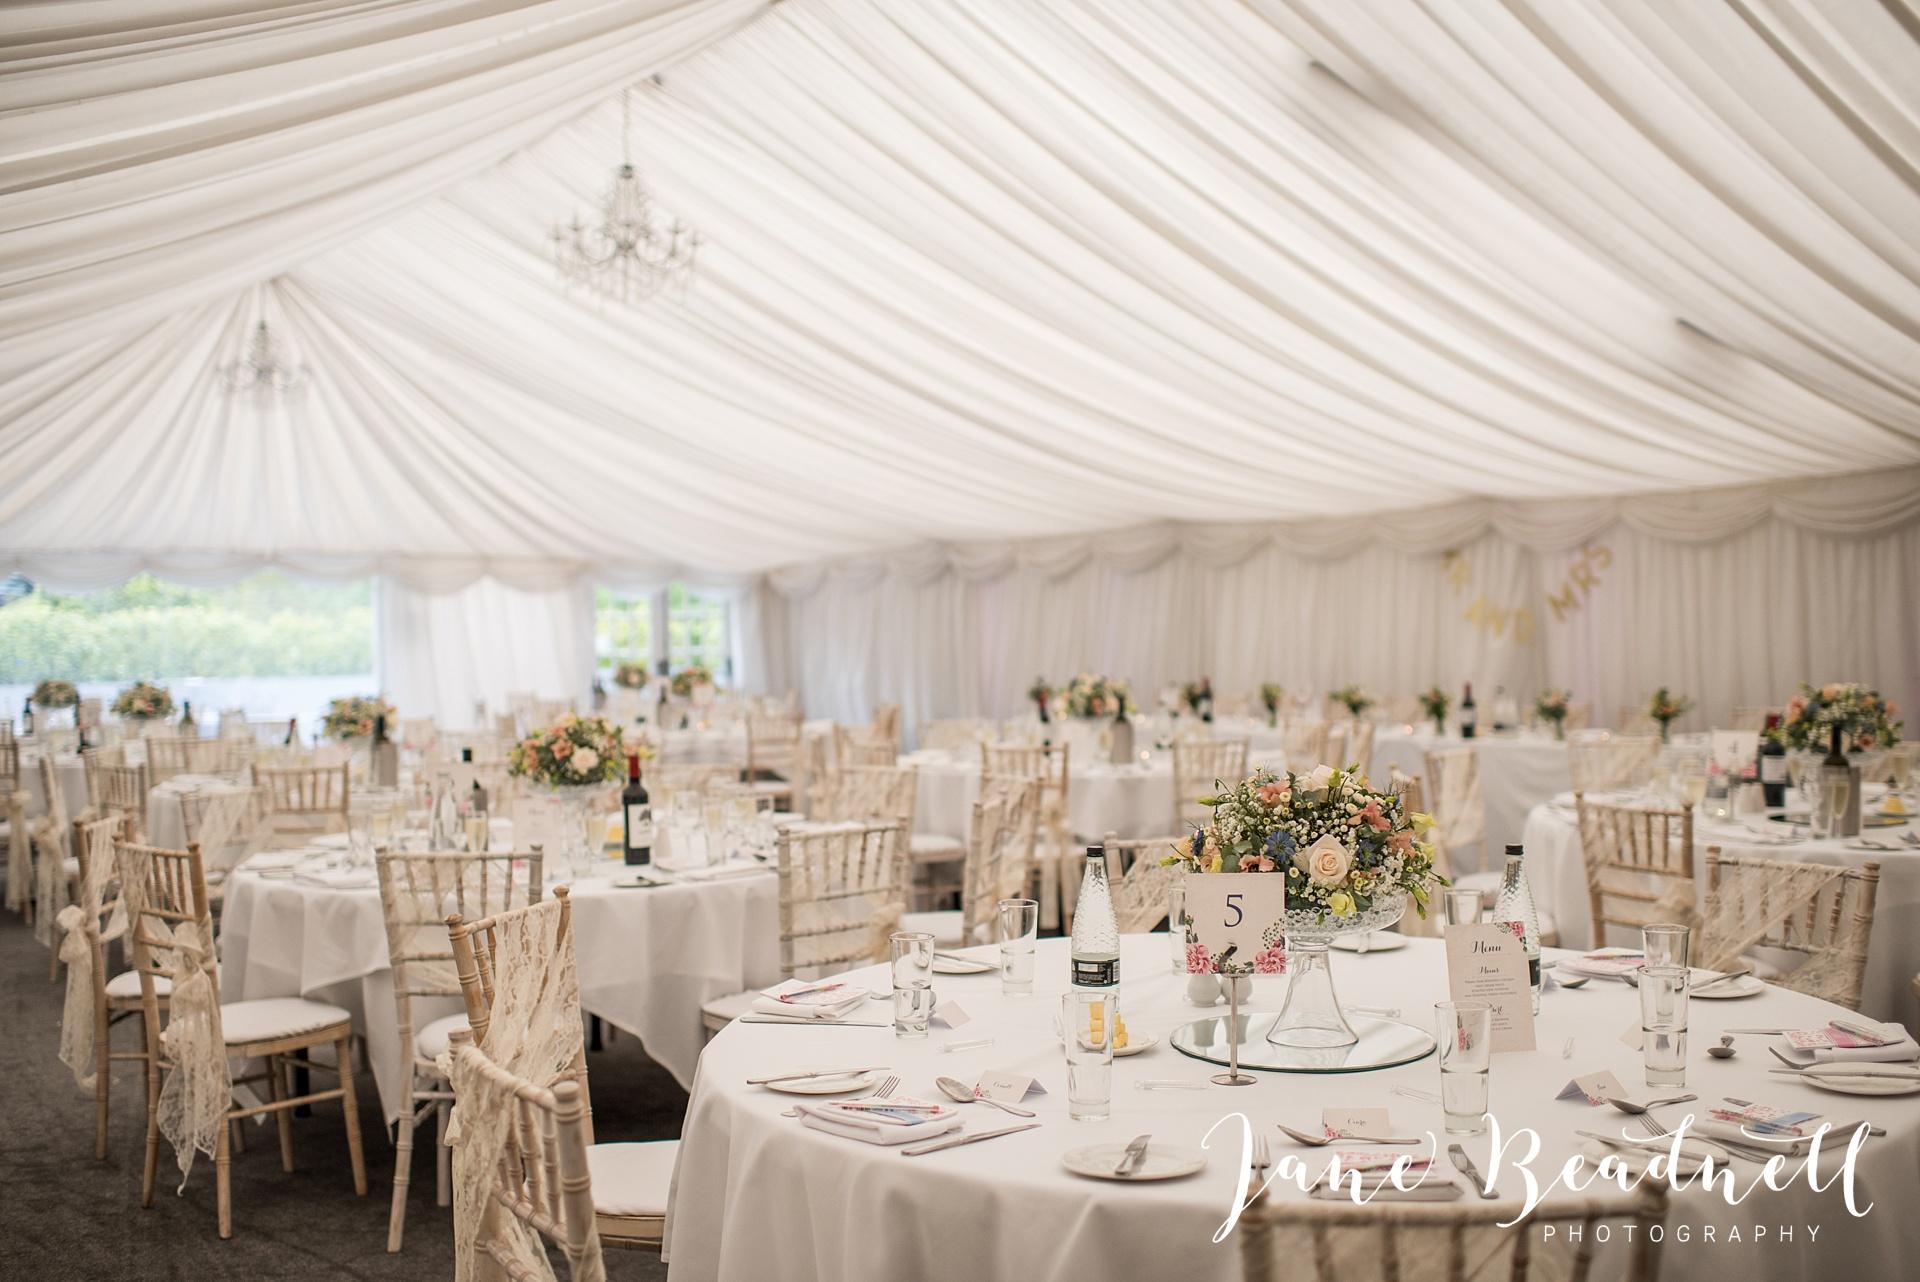 Woodlands Hotel Leeds Wedding Venue Yorkshire Wedding